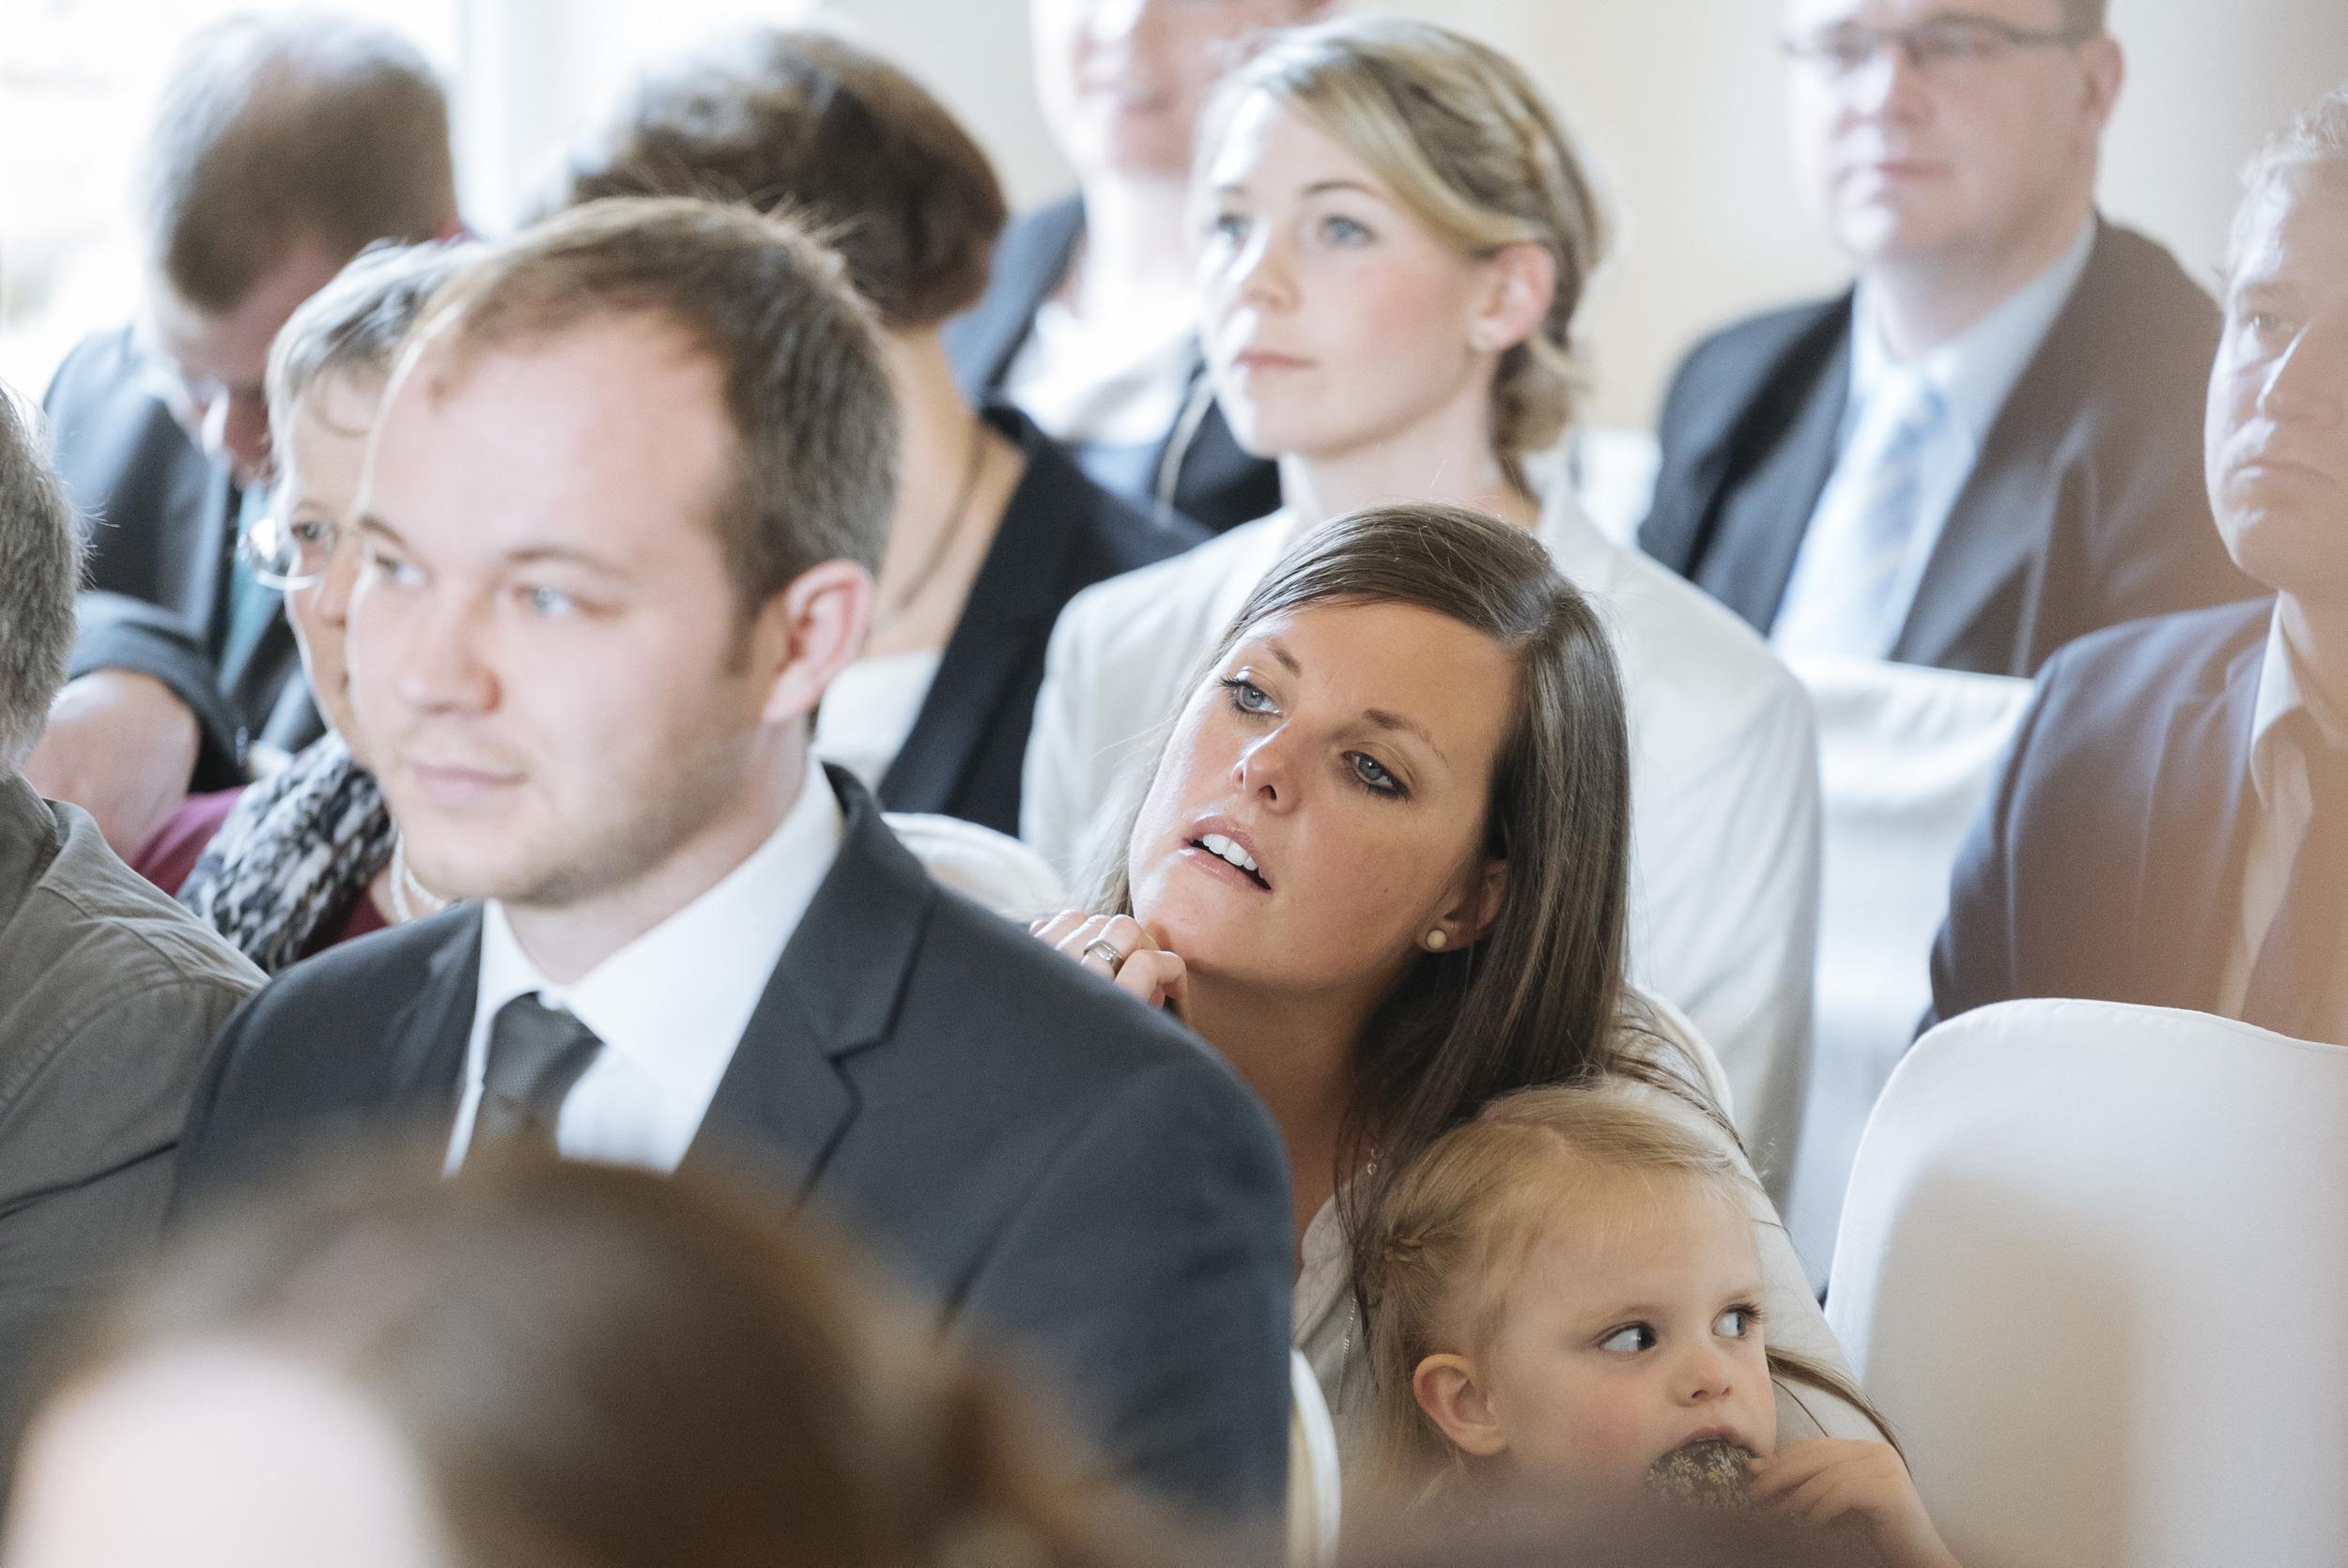 Hochzeitsfotograf-Schlossruine-Hertefeld-Weeze-073.jpg